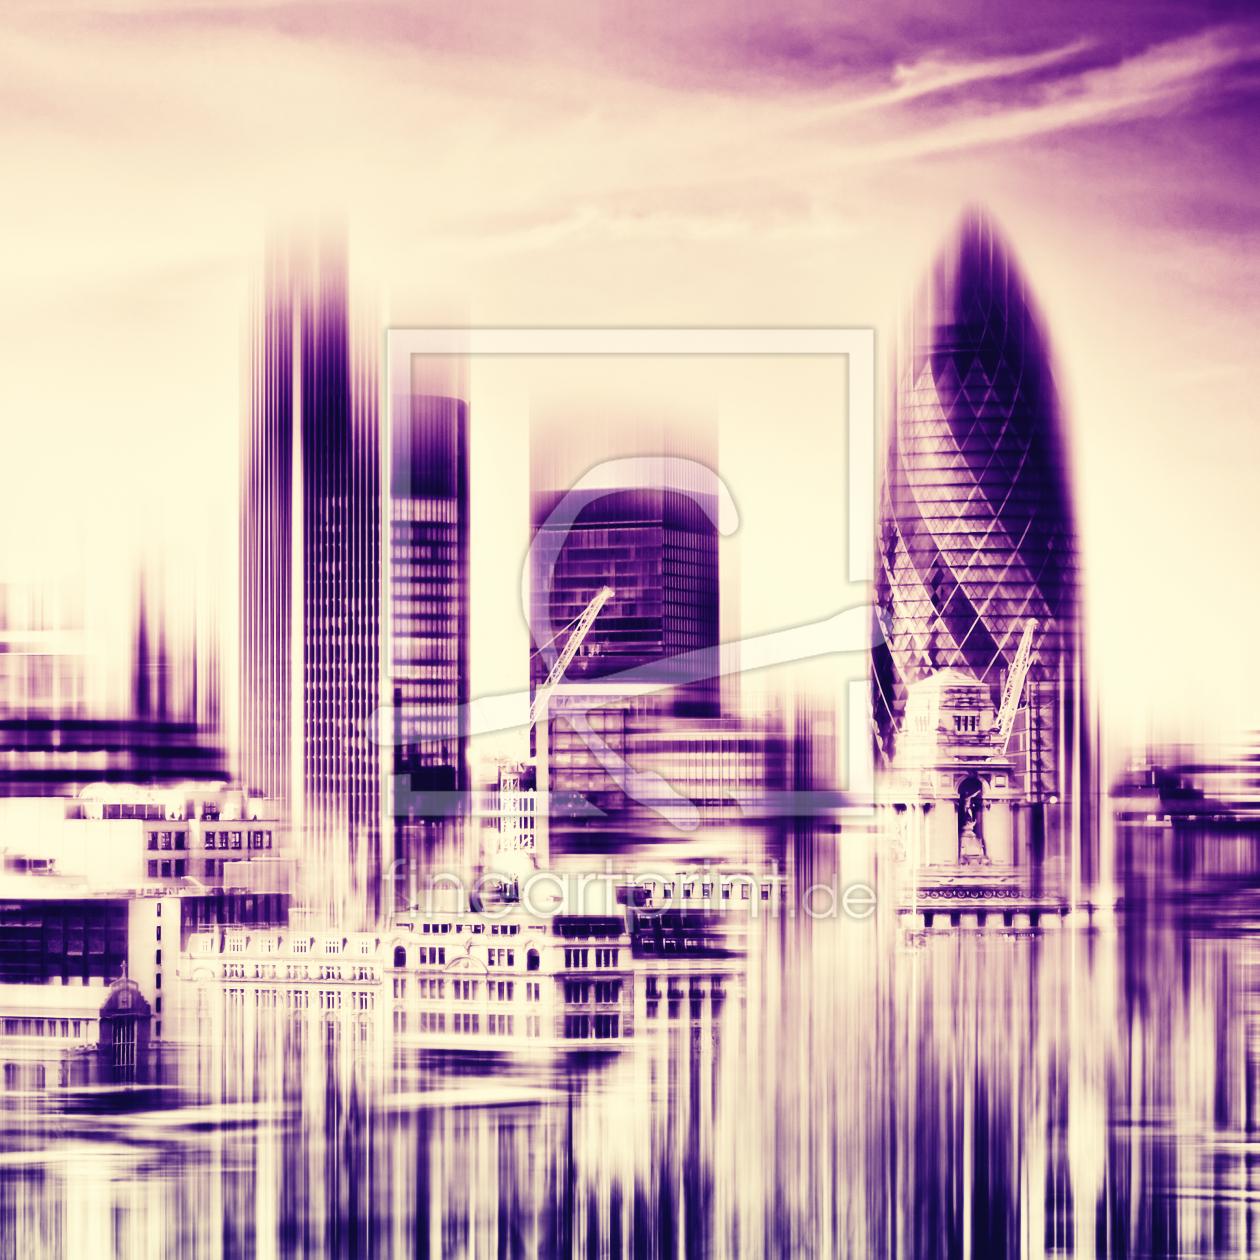 london skyline als leinwand von frank w chter erh ltli. Black Bedroom Furniture Sets. Home Design Ideas